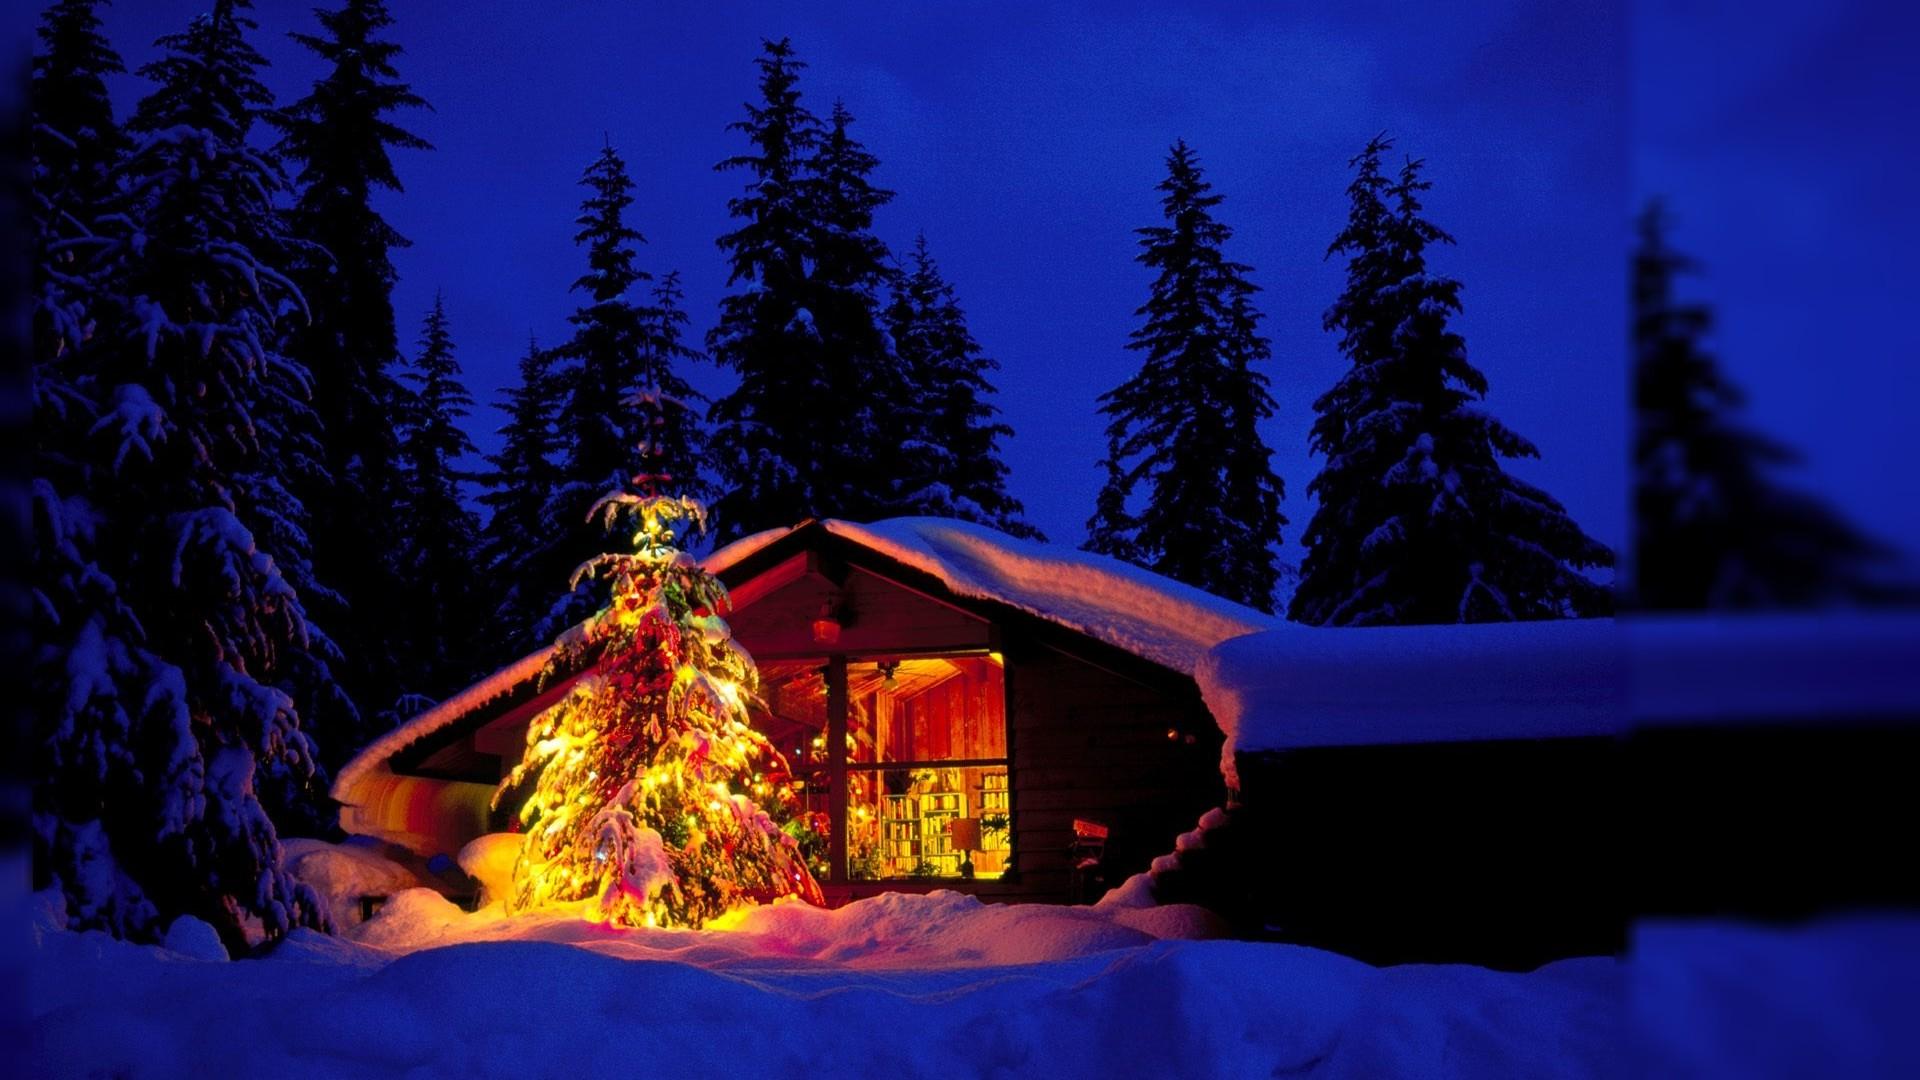 Fondos De Pantalla Navidenos Gratis: Navidad, Fondos De Navidad, Wallpapers HD